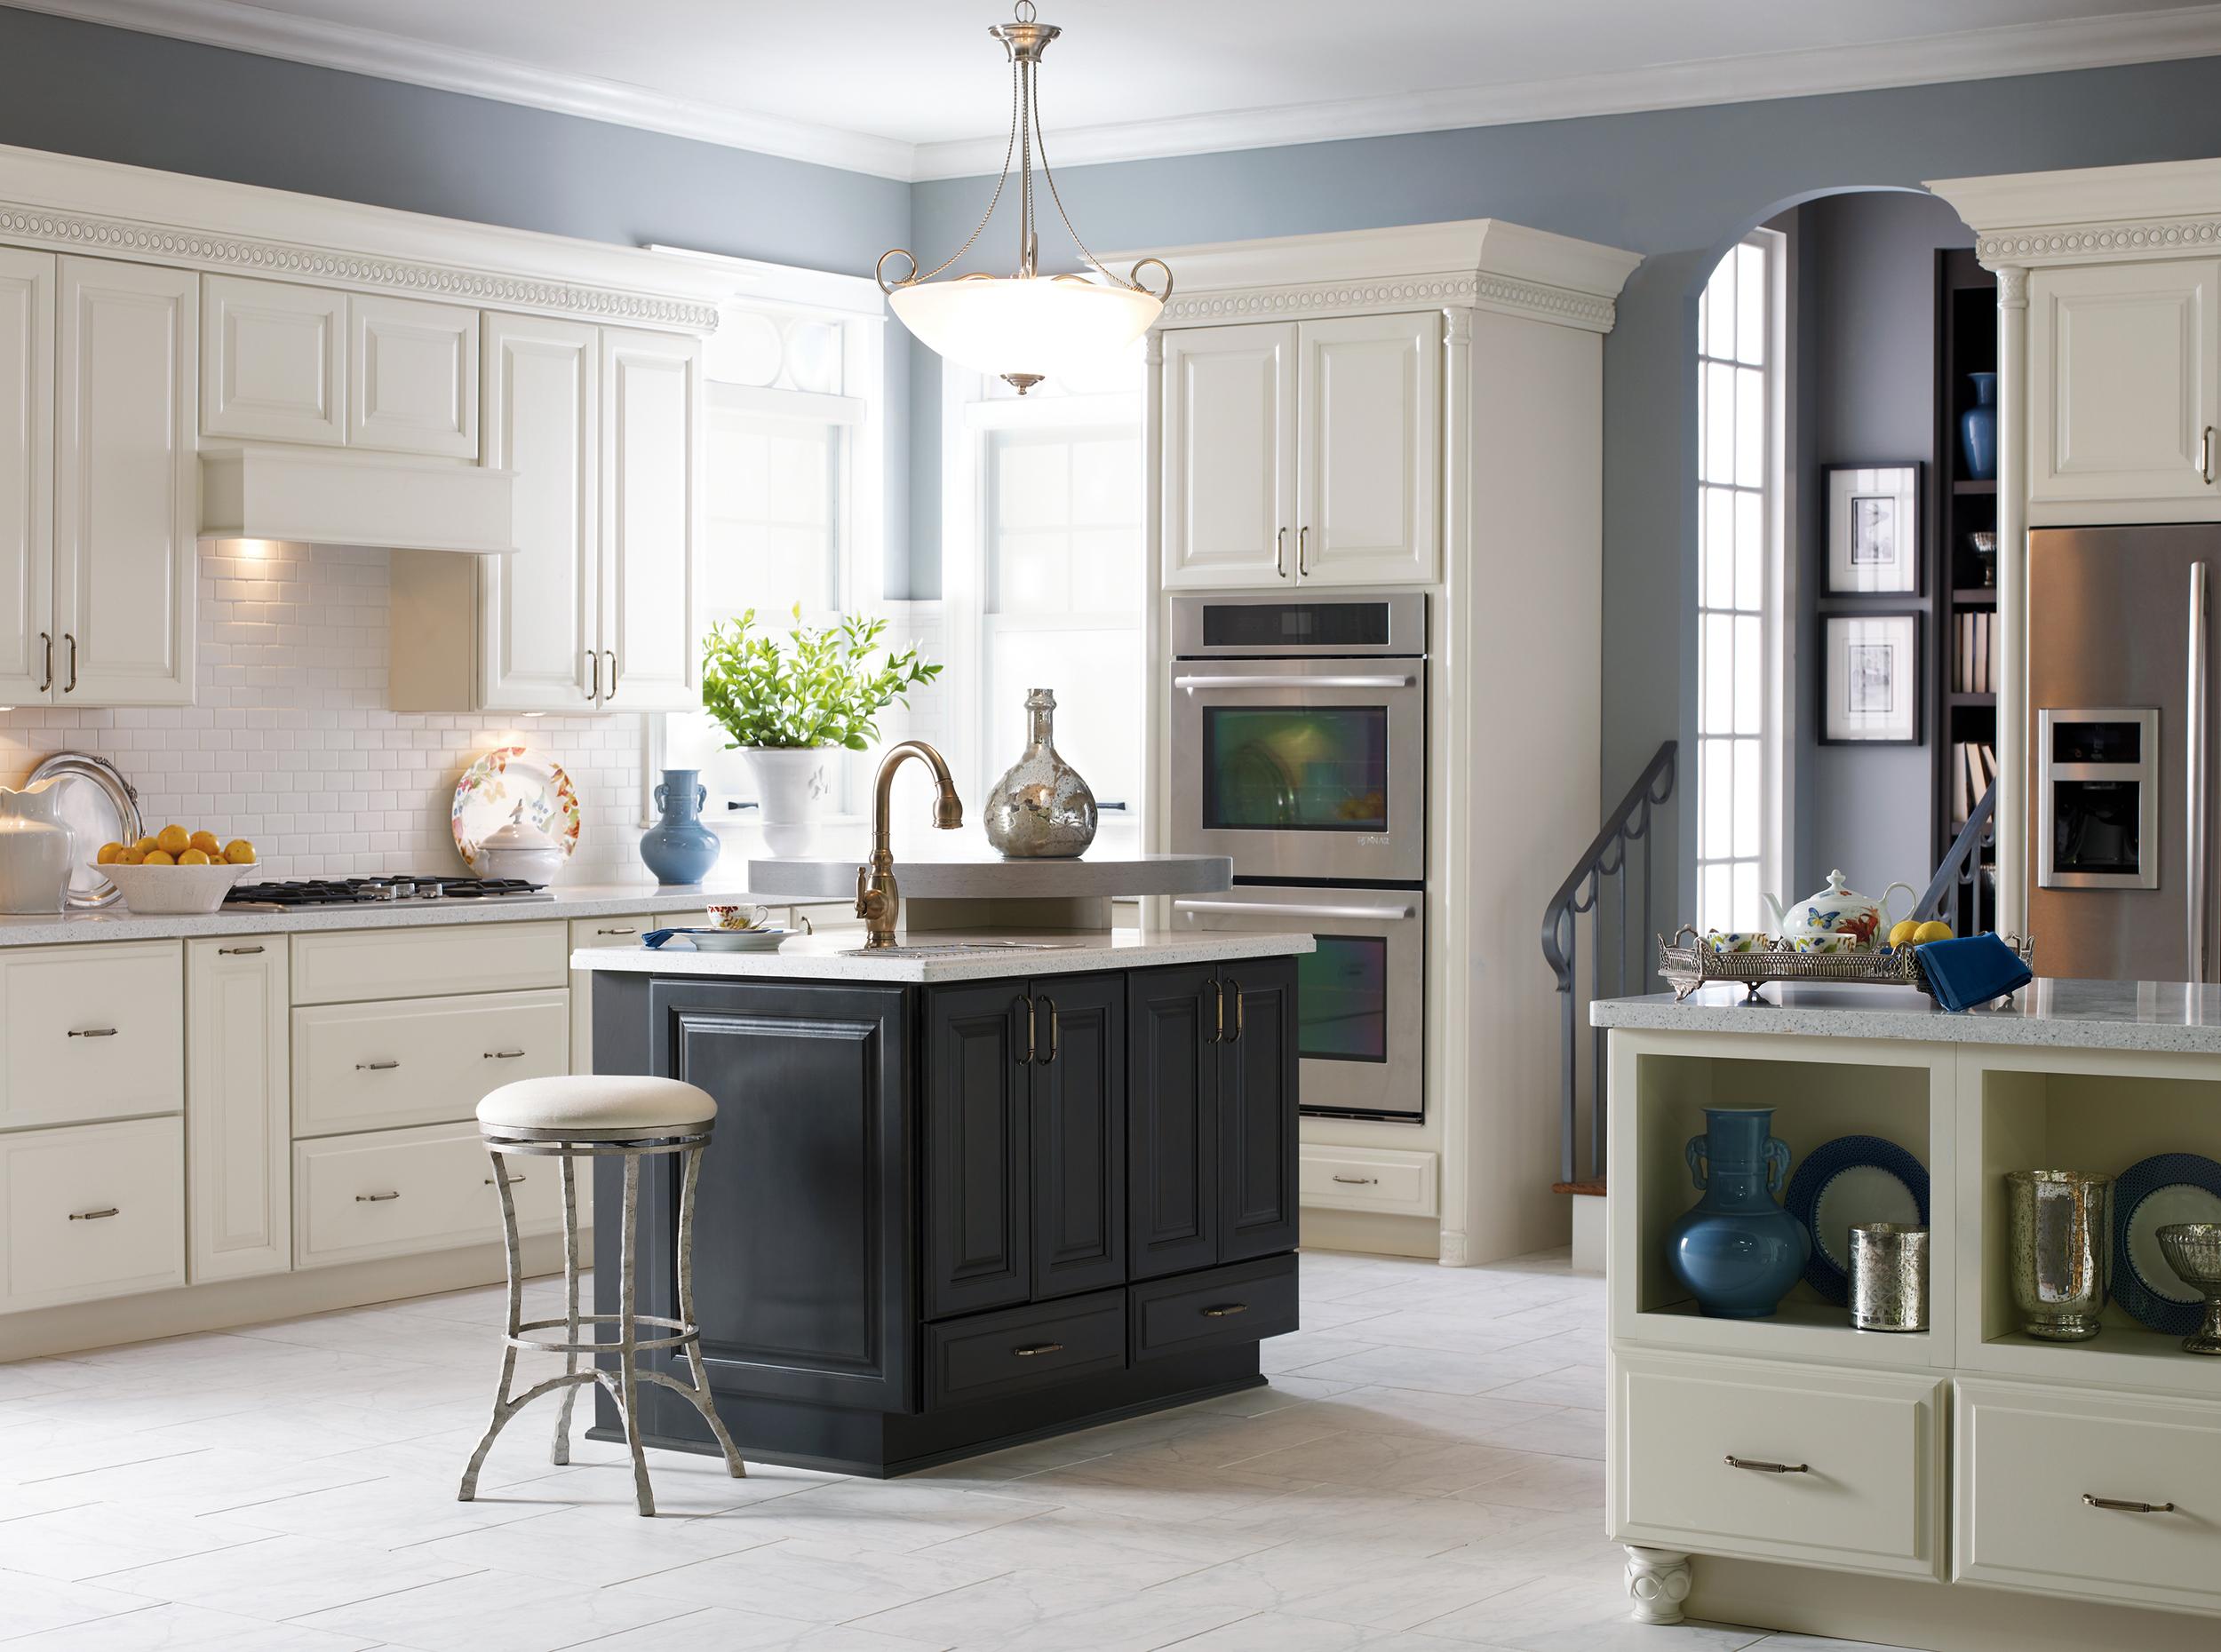 diamond kitchen and bath diamond kitchen cabinets Diamond Kitchen And Bath Pa Reviews Cliff Kitchen Diamond Kitchen and Bath